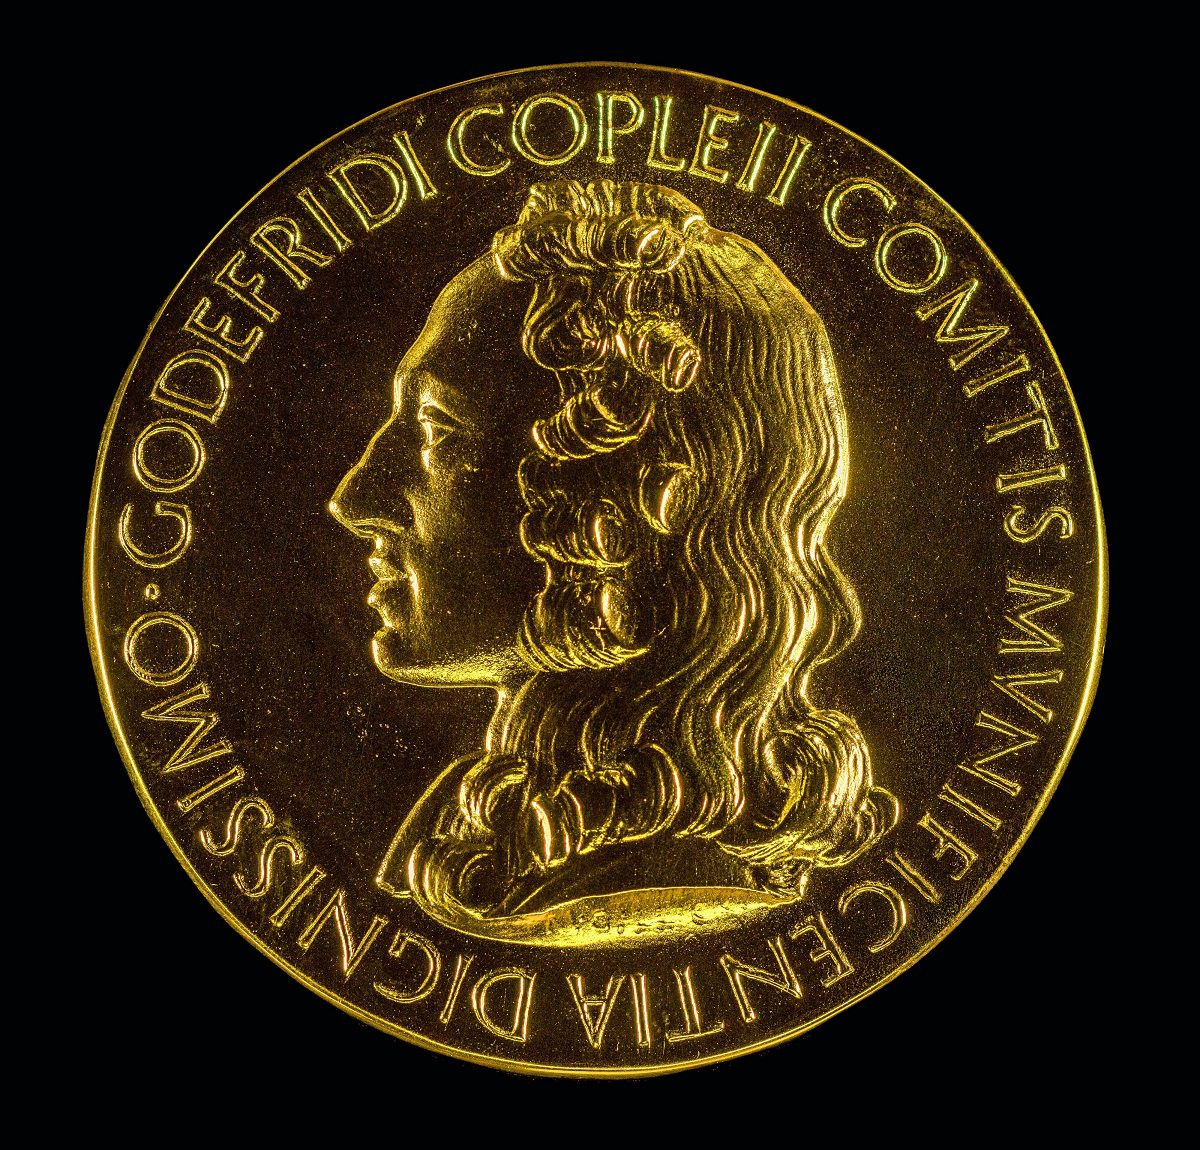 The Royal Society's Copley Medal